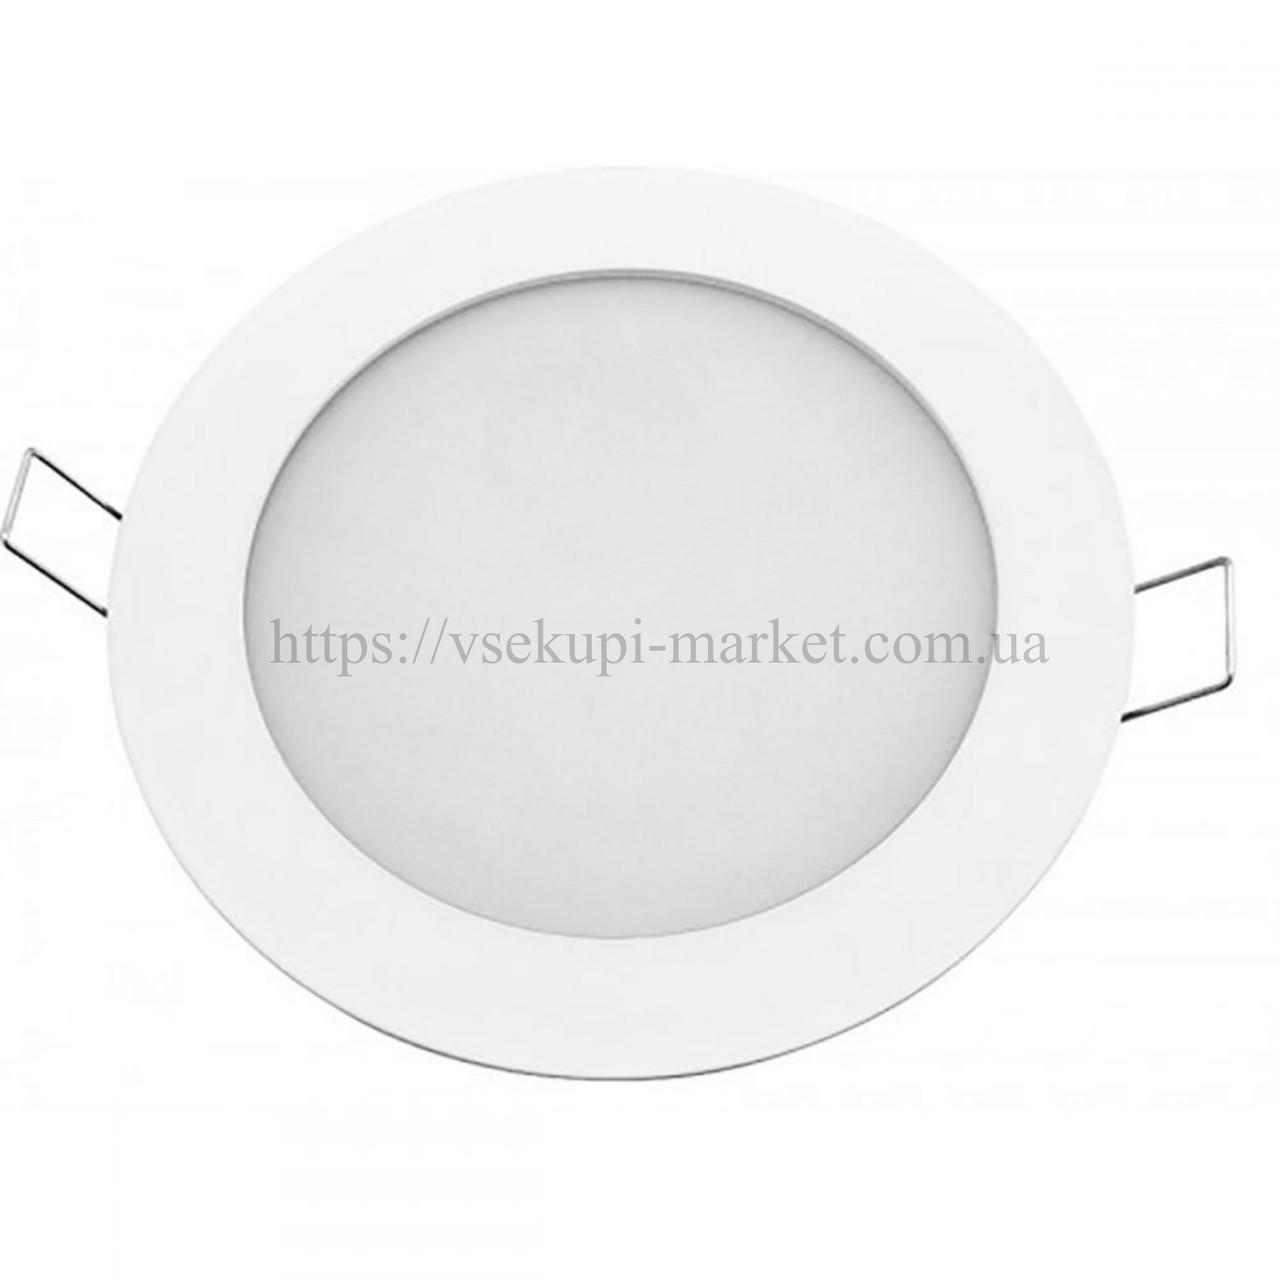 Светильник LED PANEL RIGHT HAUSEN круг SIMPLE 6W 4000K IP20 HN-238020